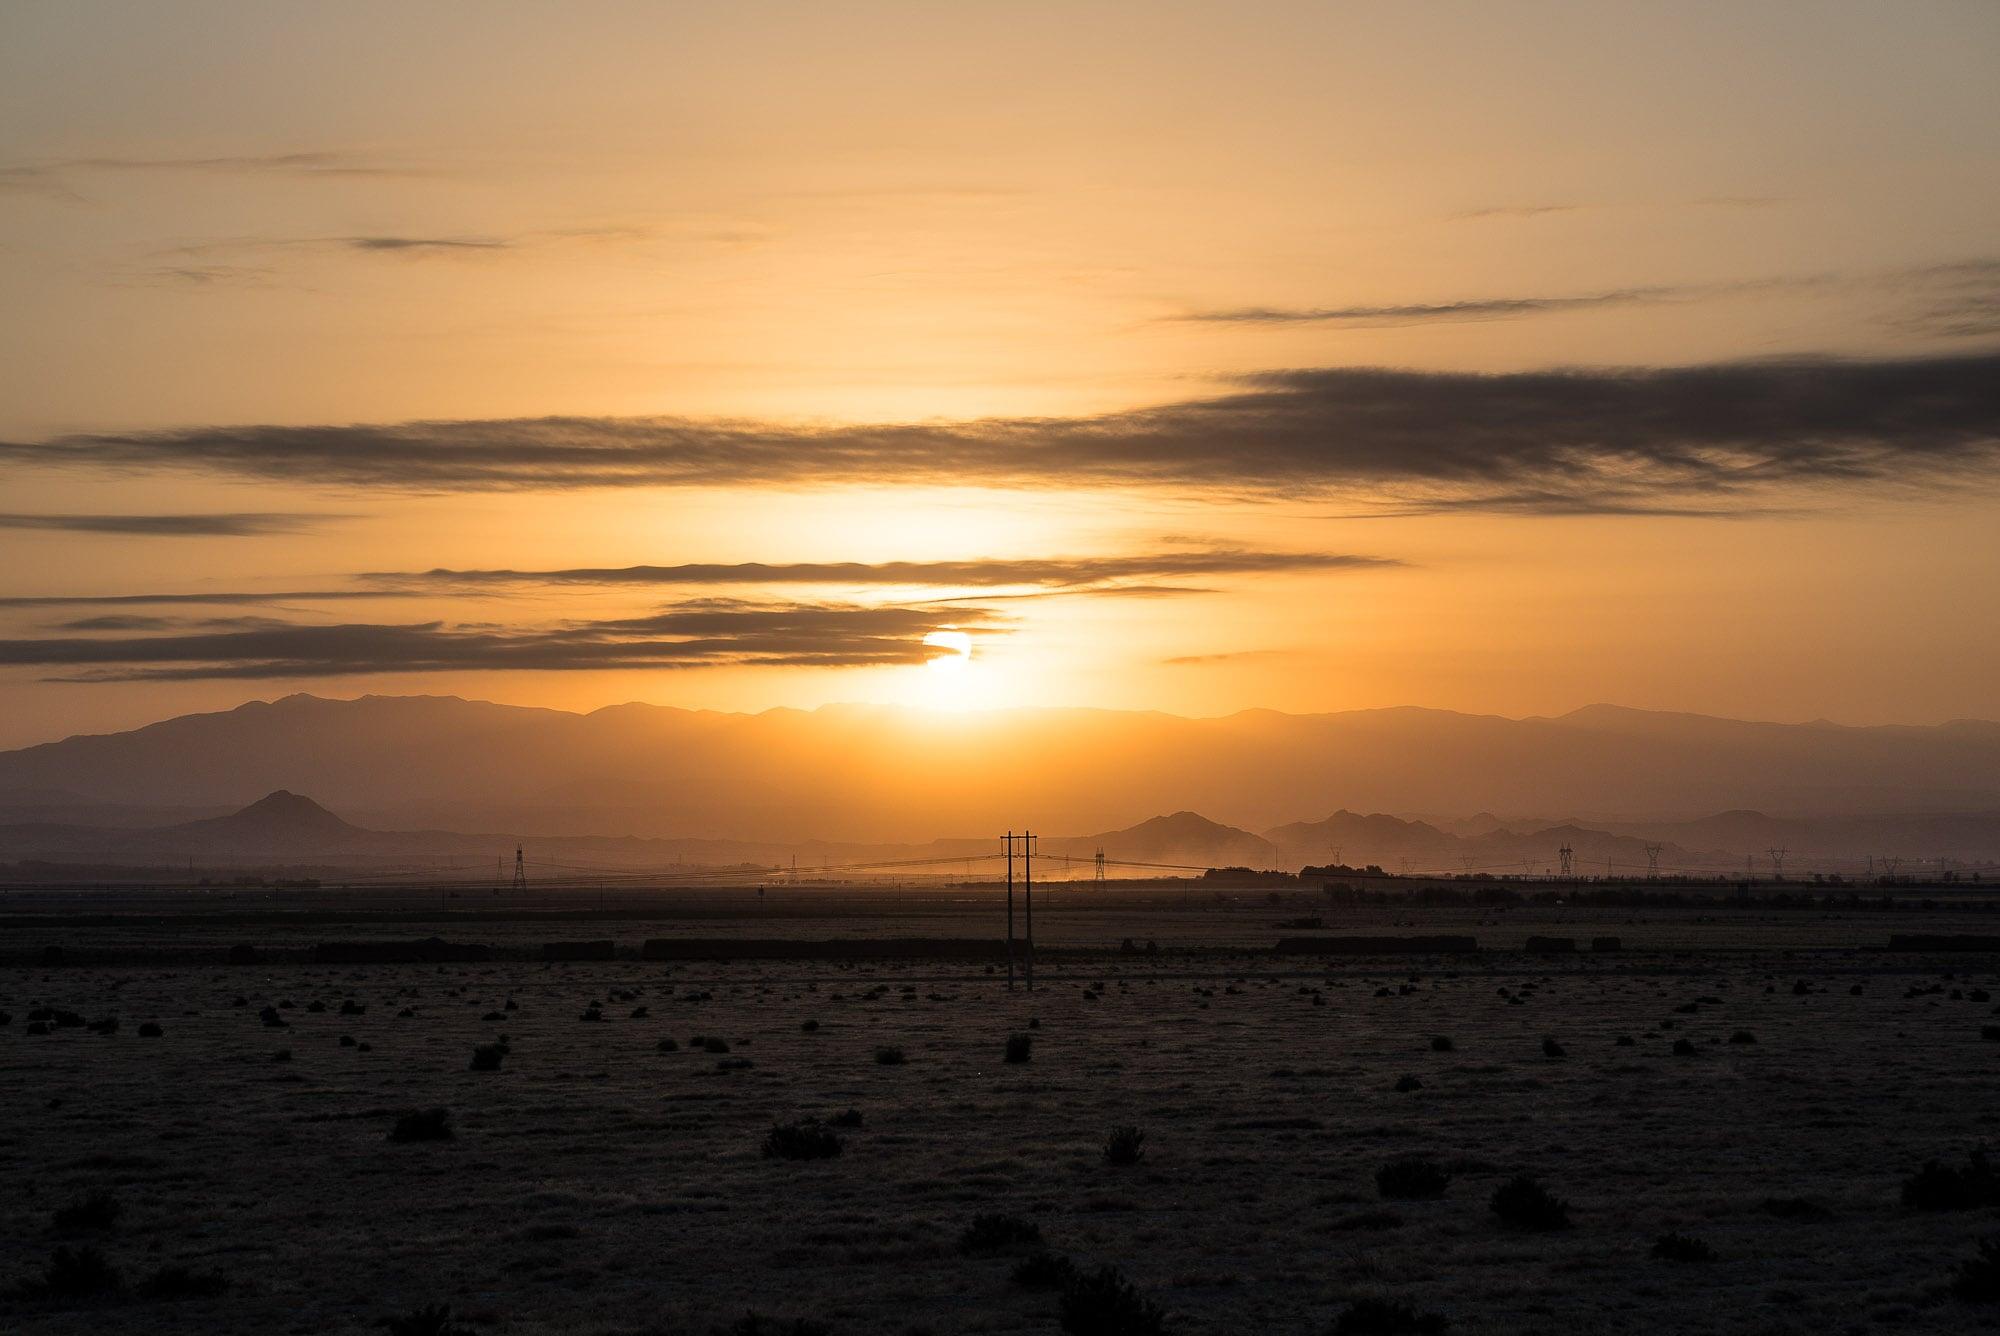 sunset near Razaviye